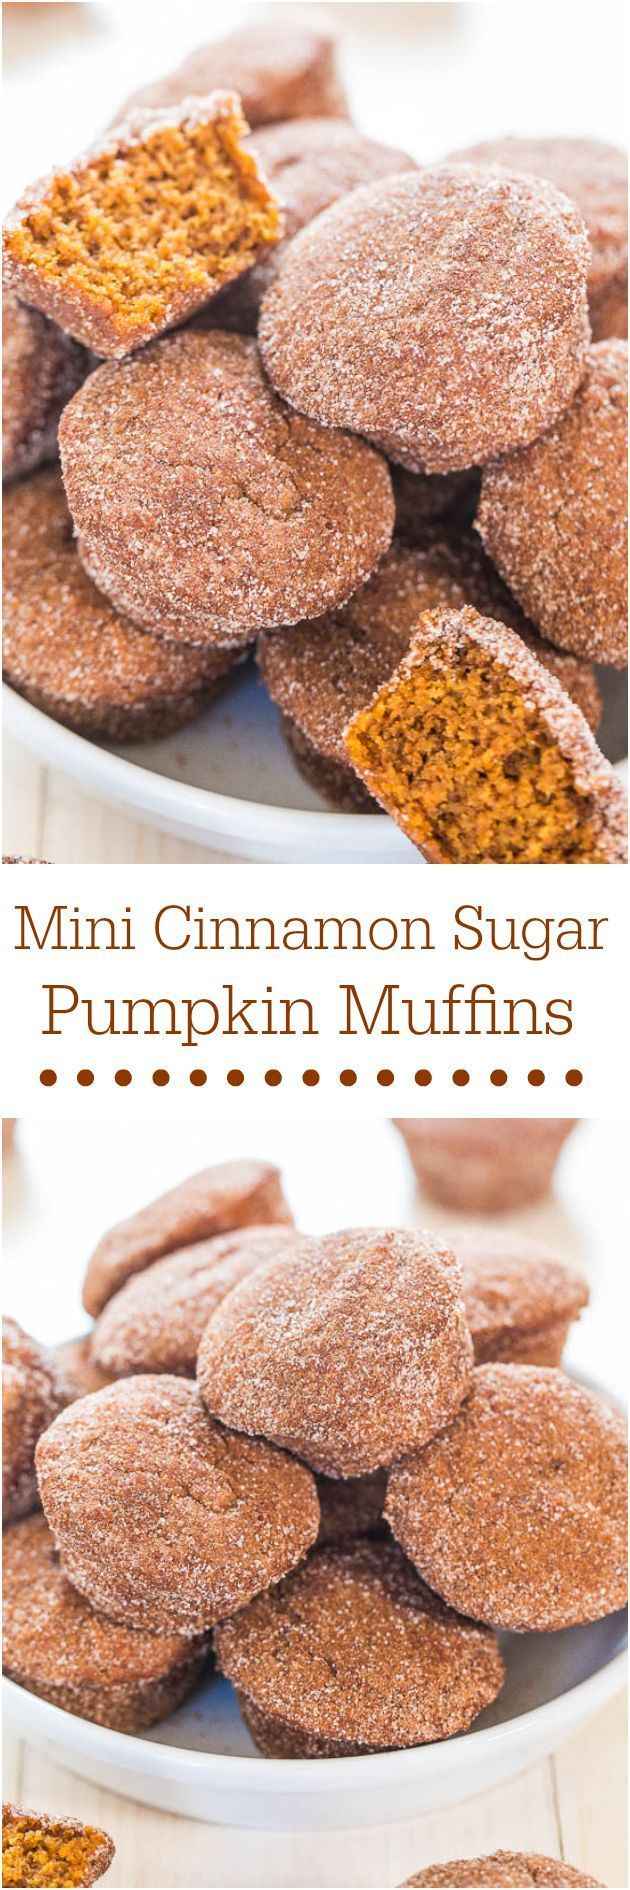 Mini Cinnamon Sugar Pumpkin Muffins | Soft little muffins that pack a big punch.